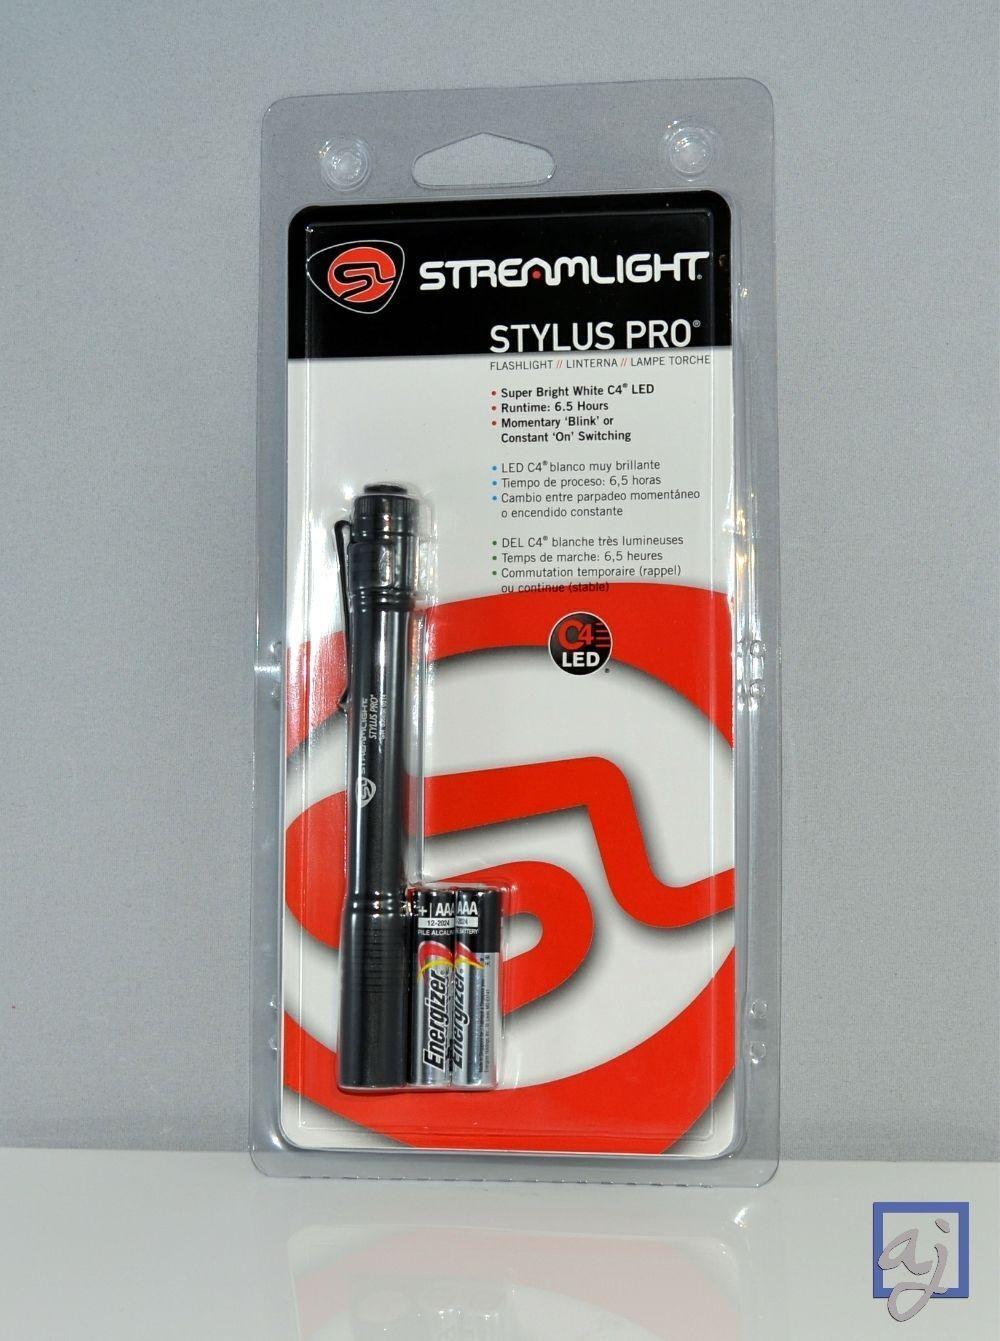 Nouveau Modèle - Streamlight Stylus Stylus Stylus Pro Led AAA Poche Lampe Torche / Stylo Léger dc6d4e